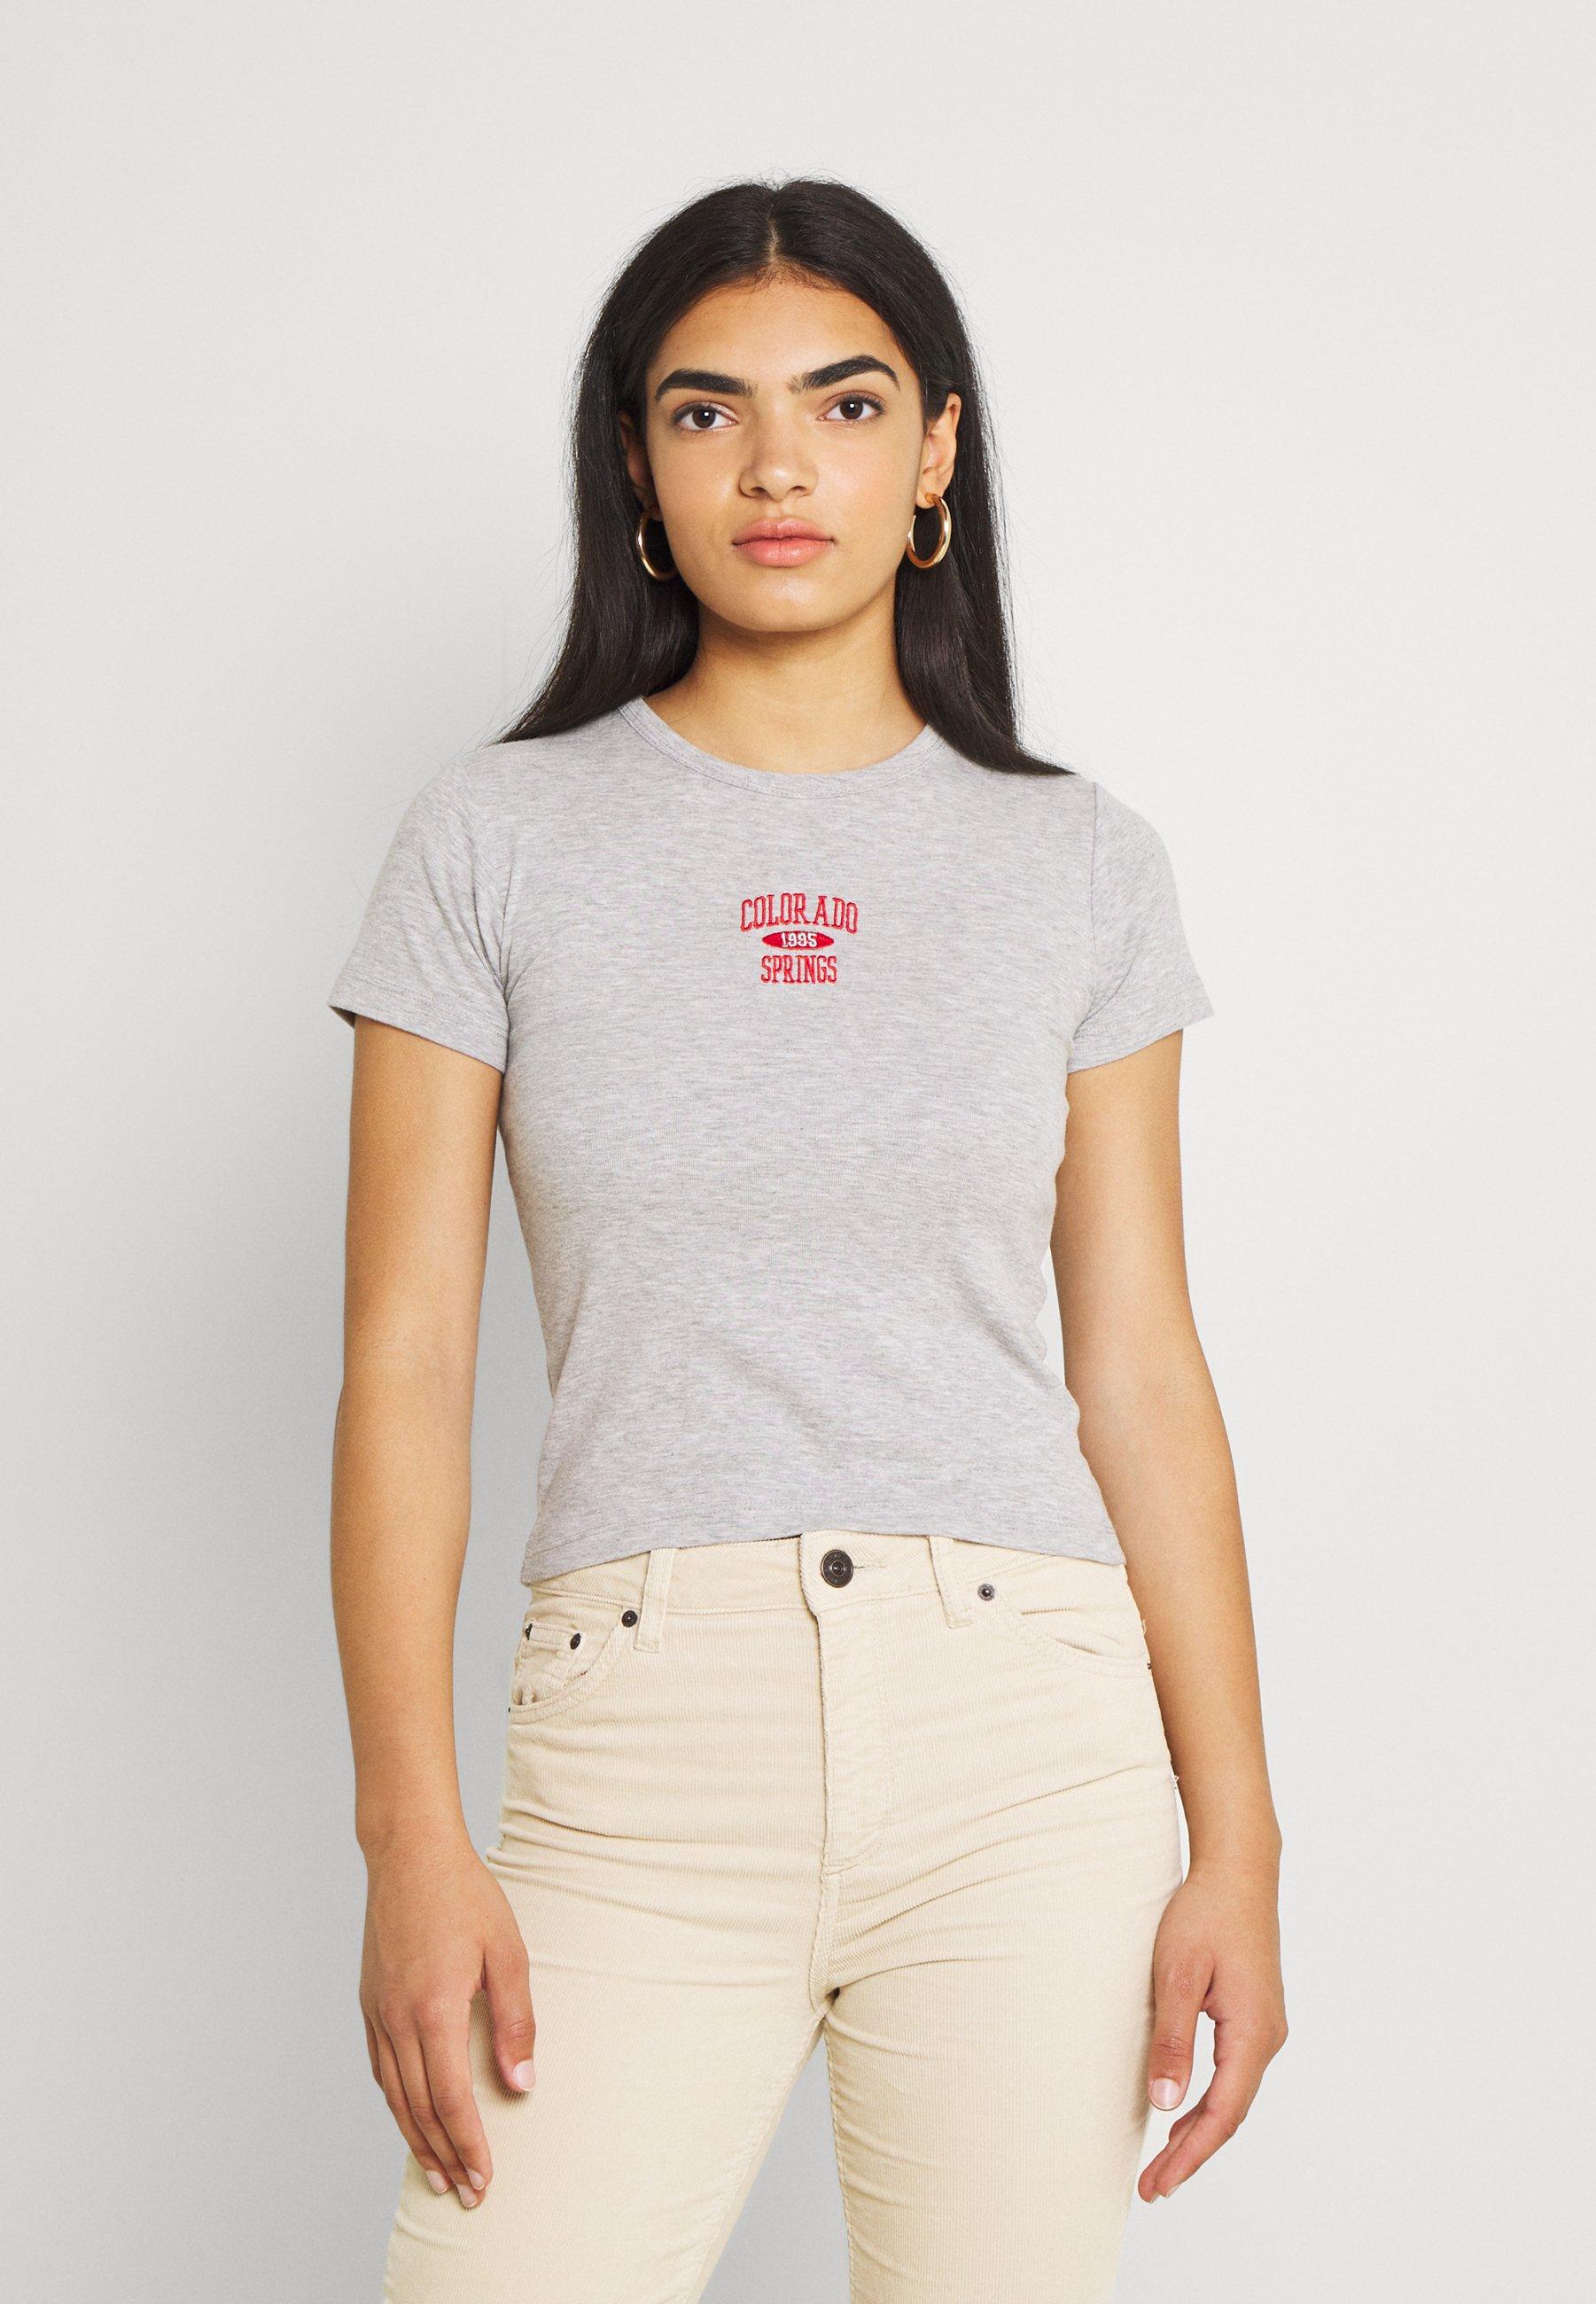 Women COLORADO SPRINGS BABY TEE - Print T-shirt